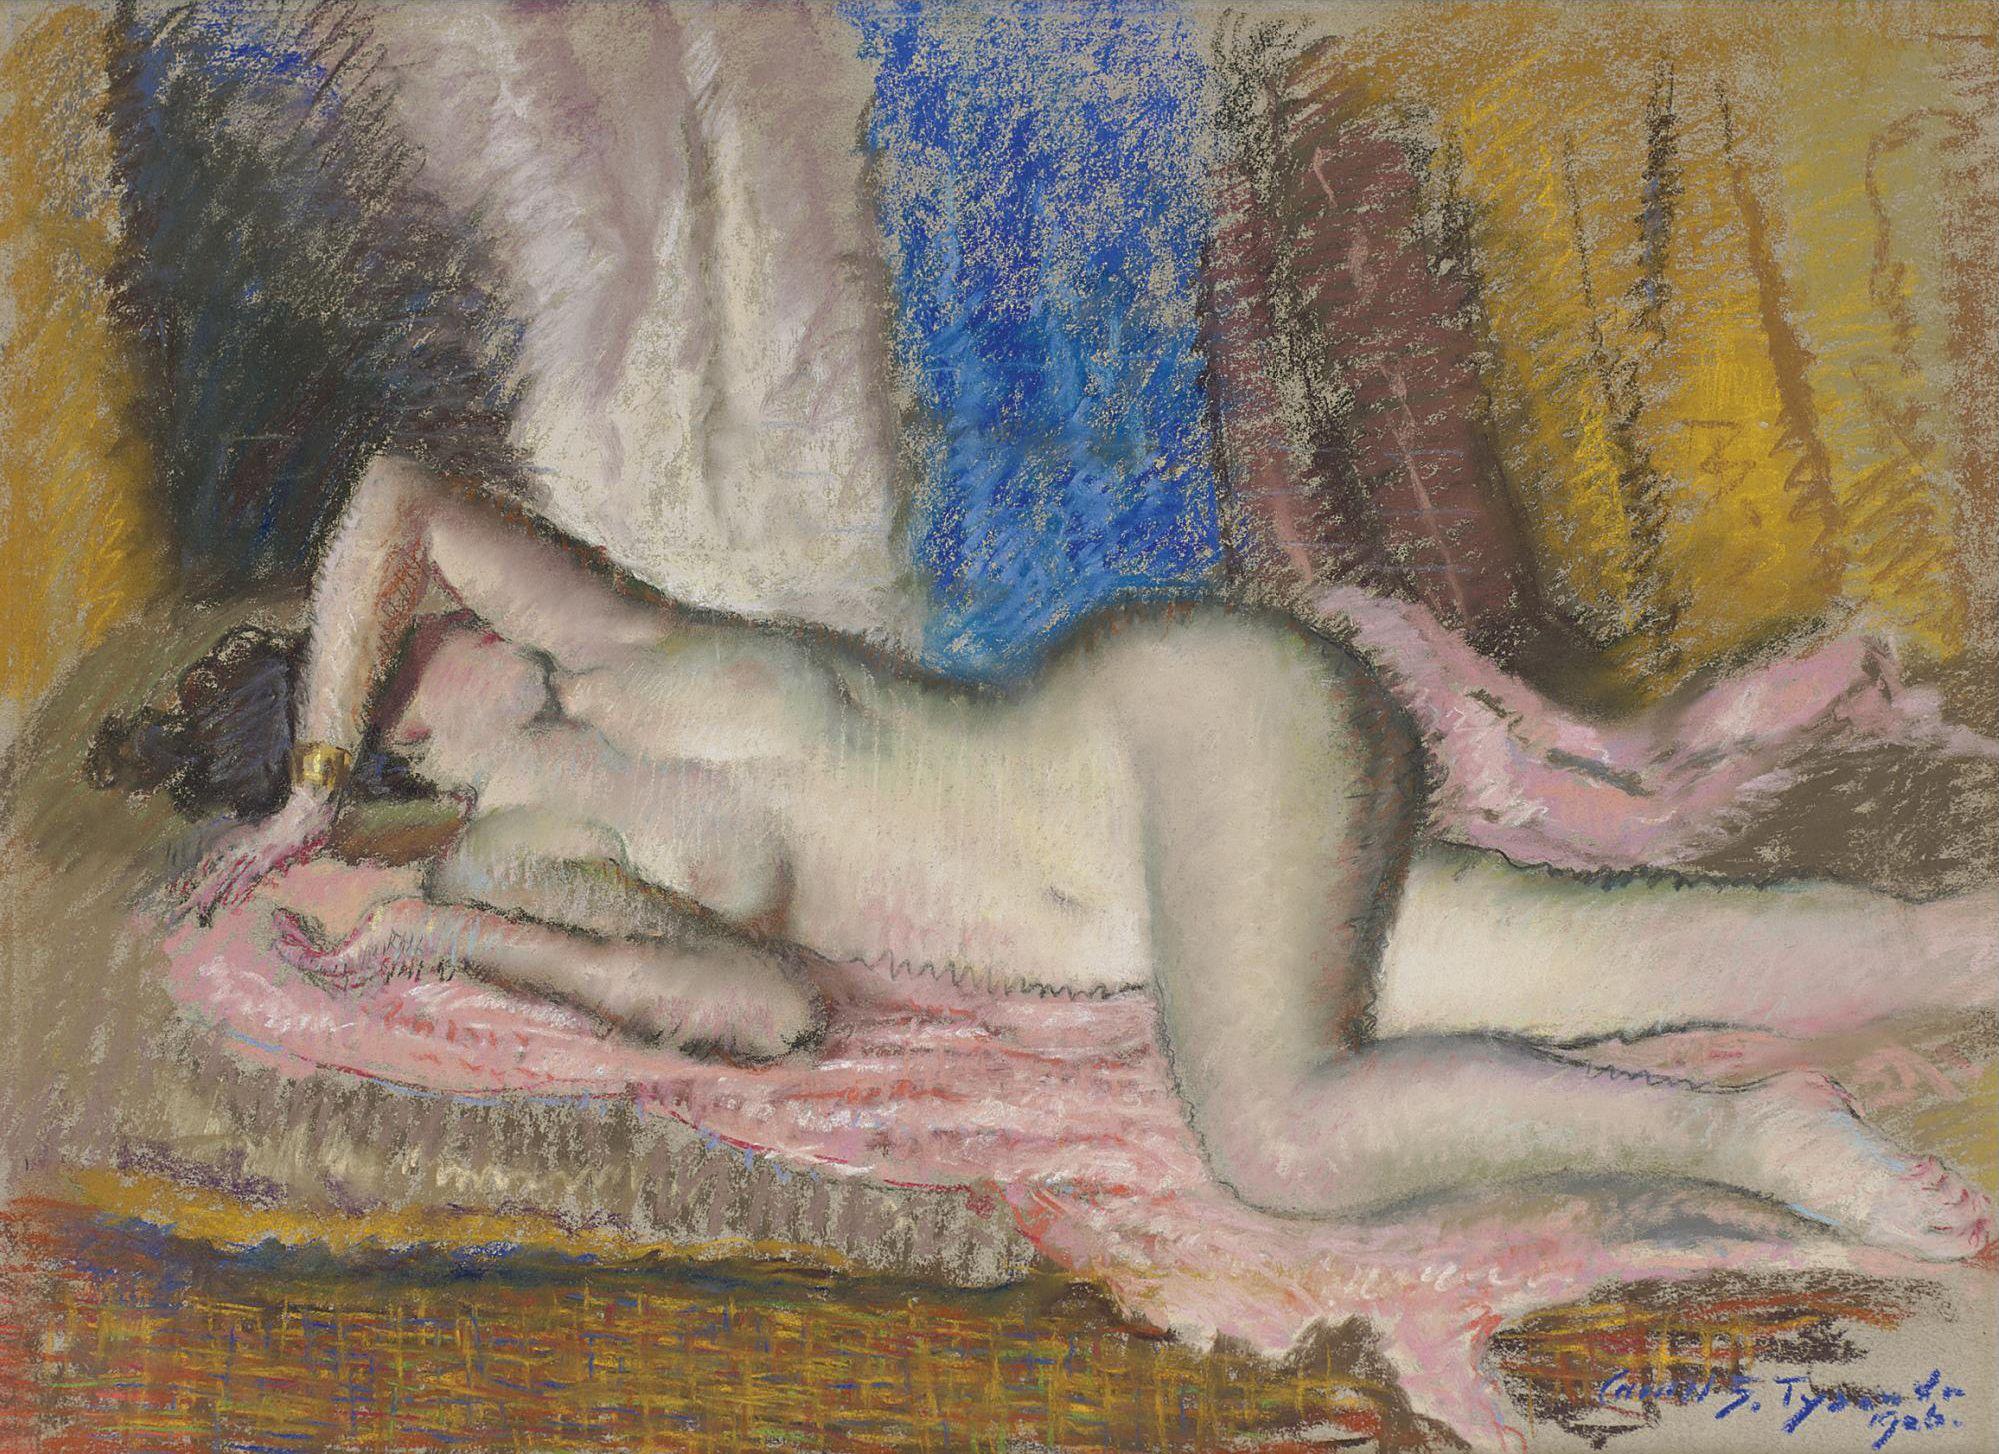 Carroll Sargent Tyson, 1877-1956. Лежащая обнаженная. 48.9 х 64.8 см. пастель. Частная коллекция